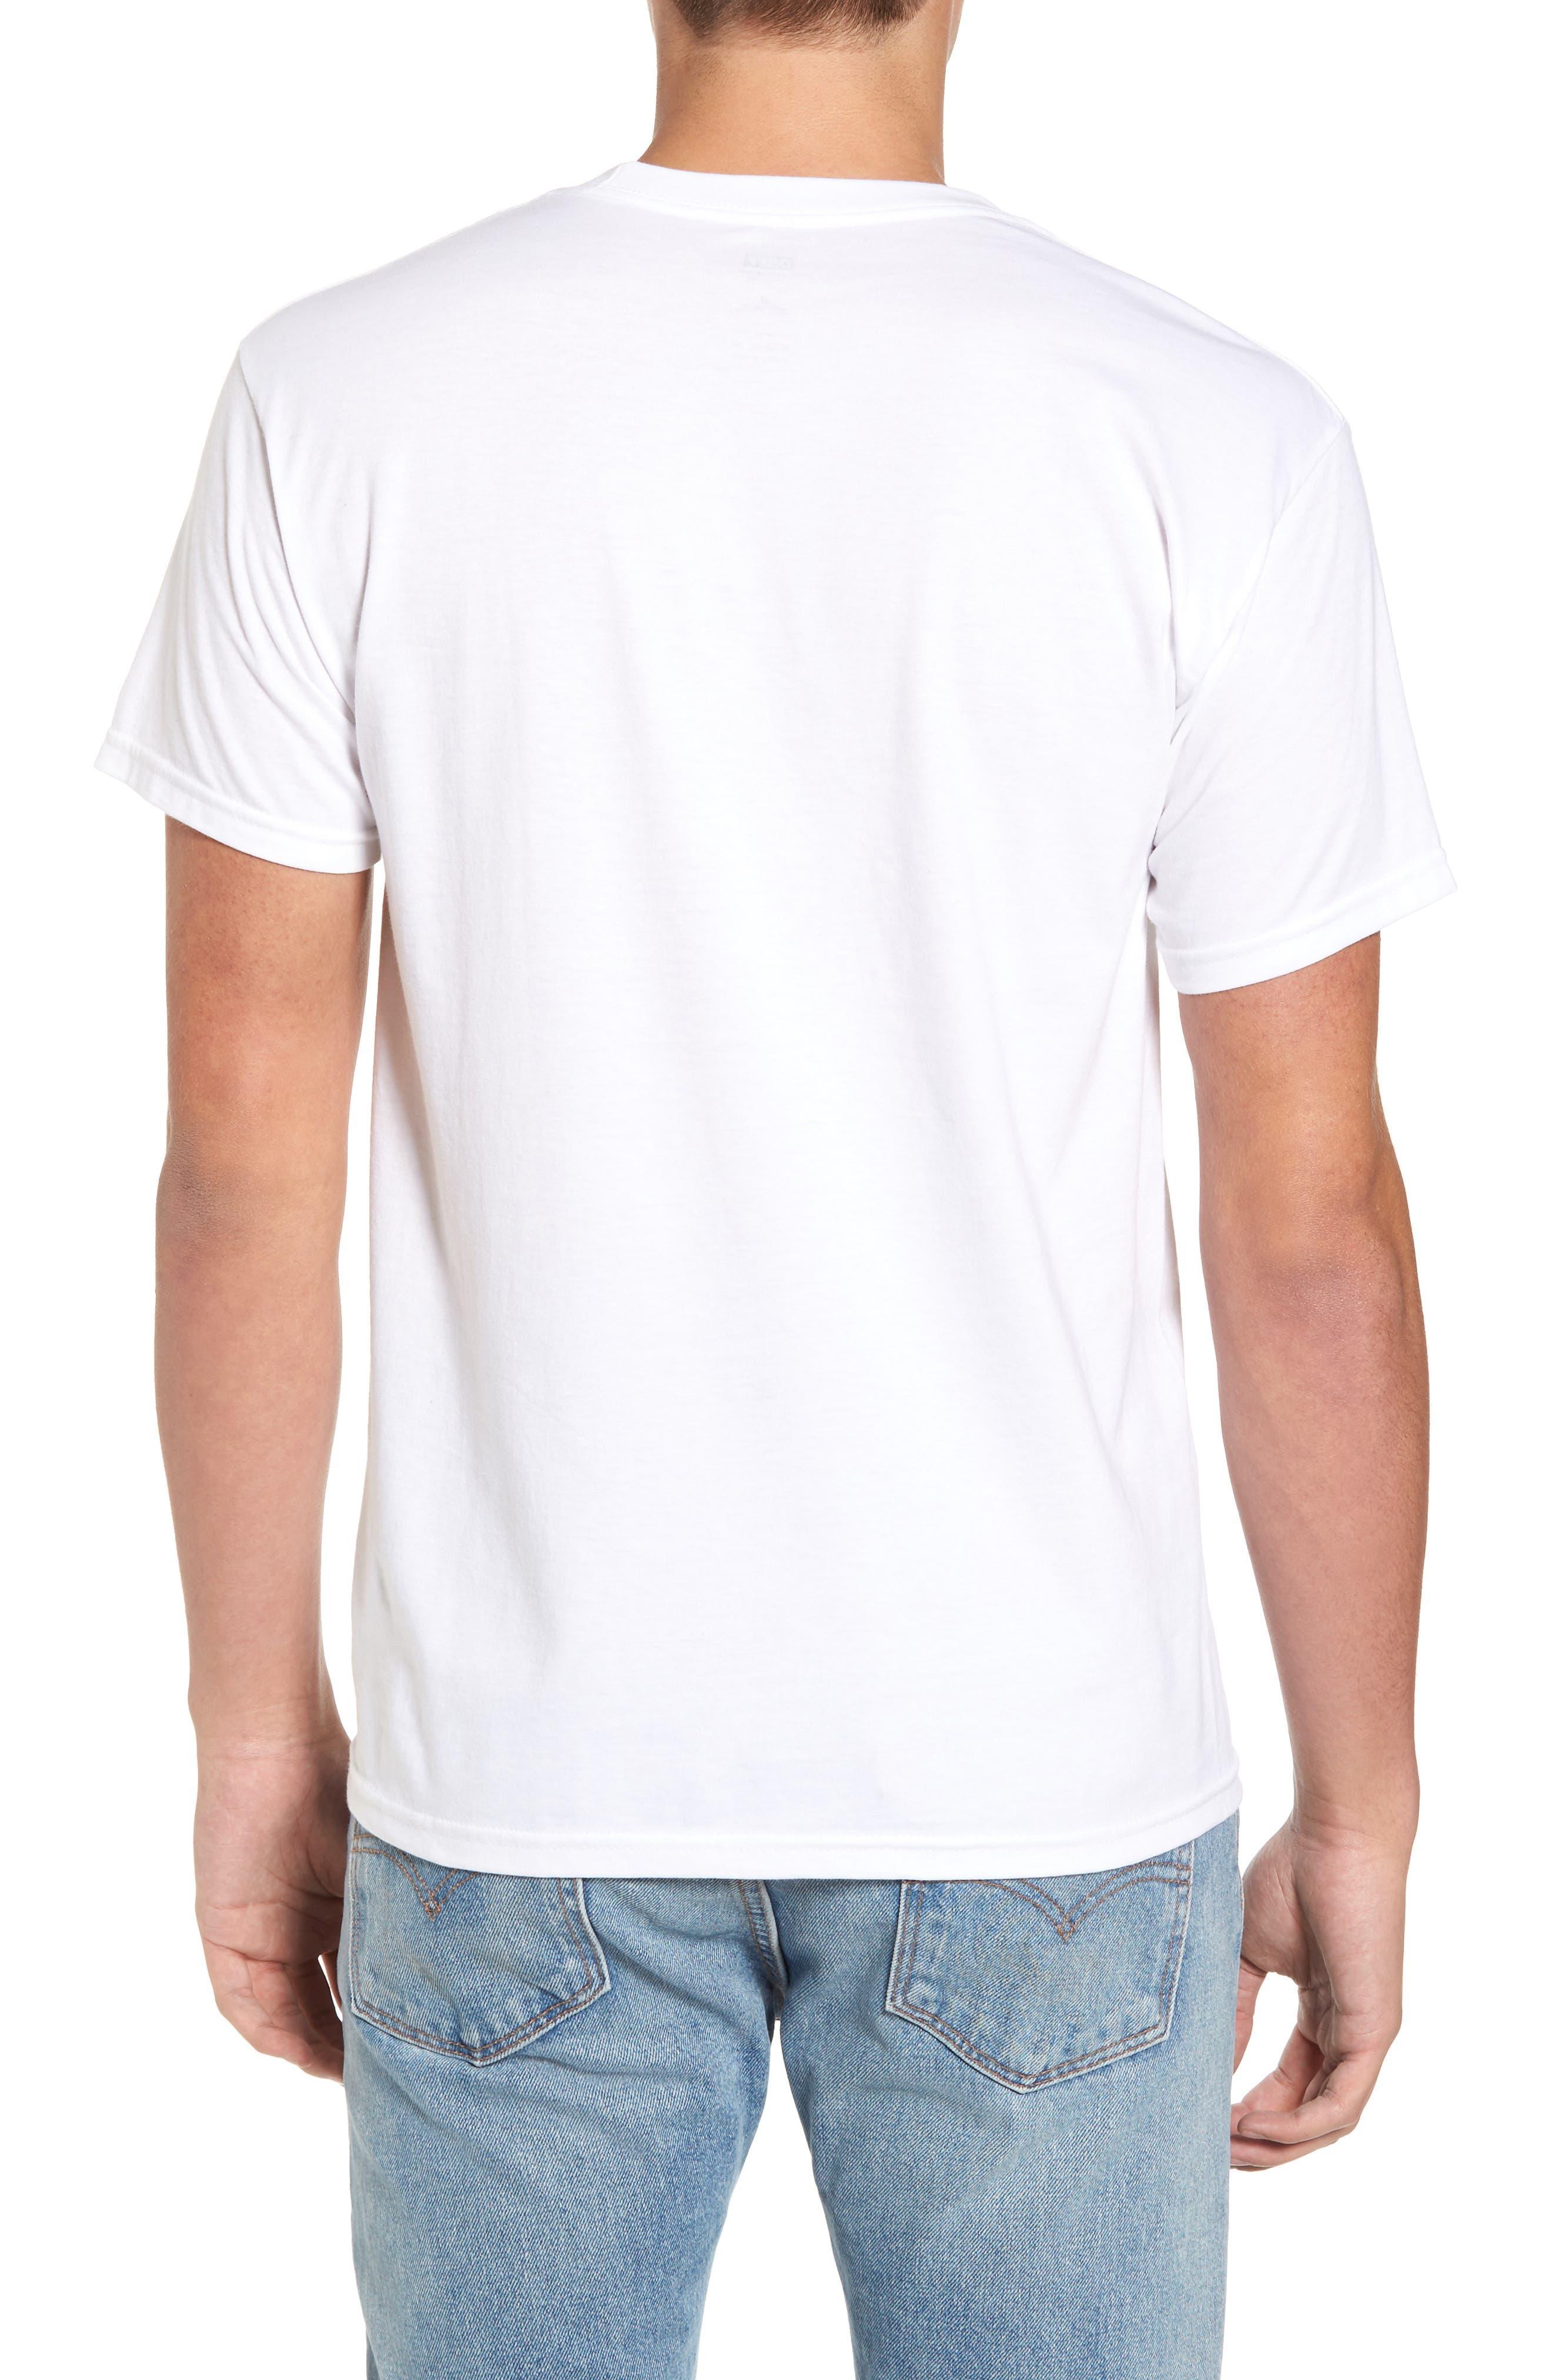 VIP Premium T-Shirt,                             Alternate thumbnail 2, color,                             100